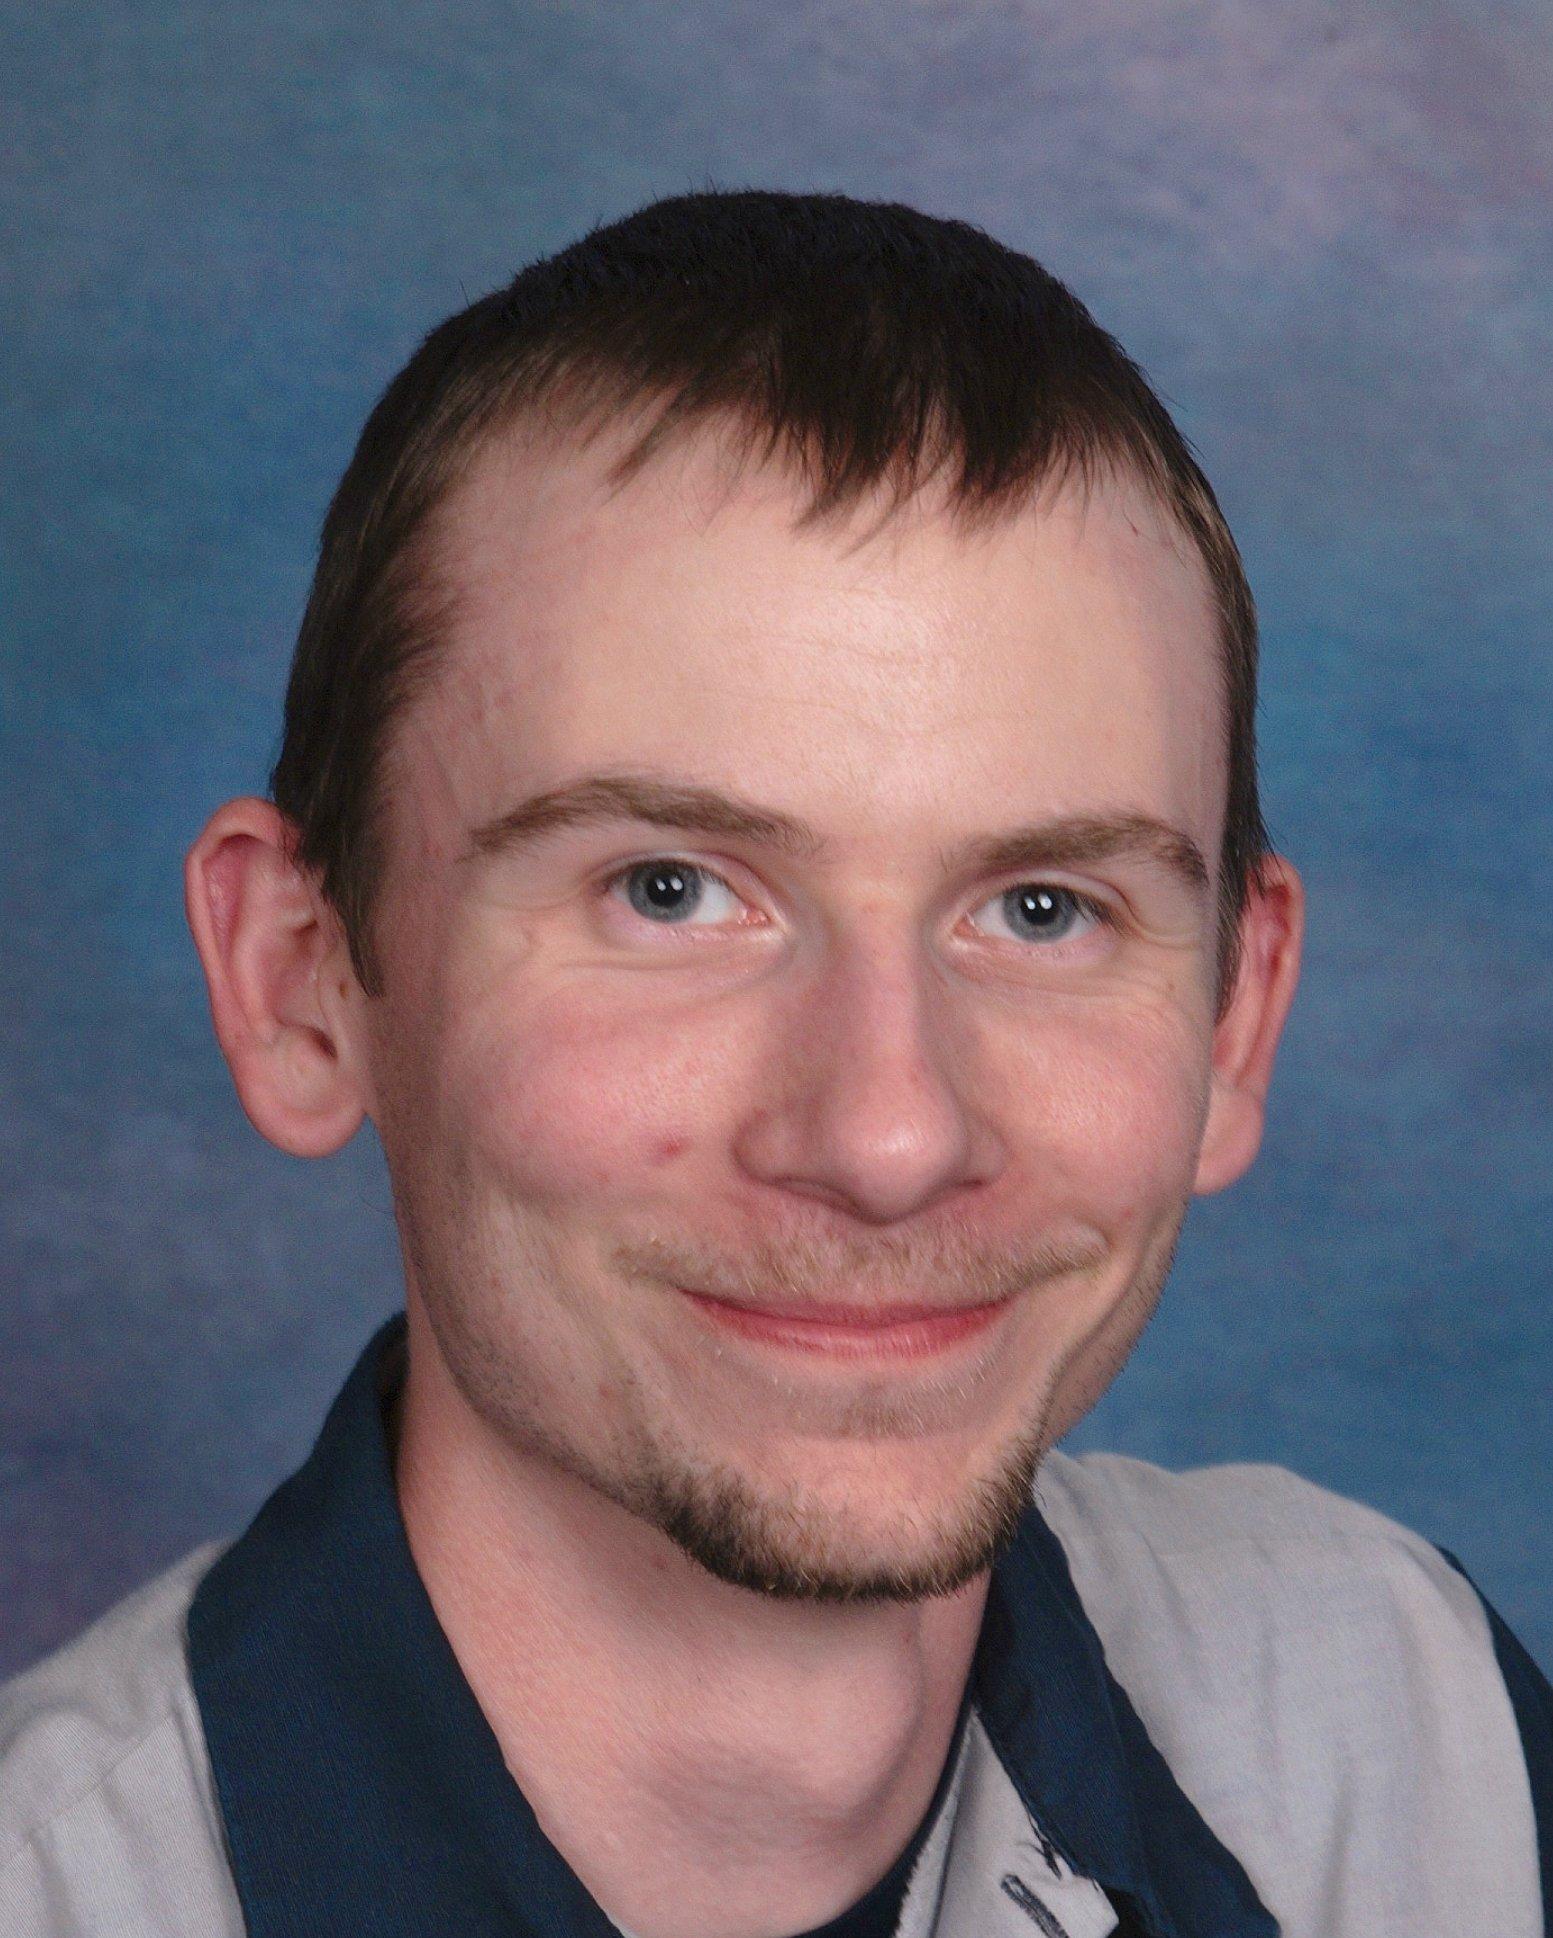 Ryan Barber - Technician